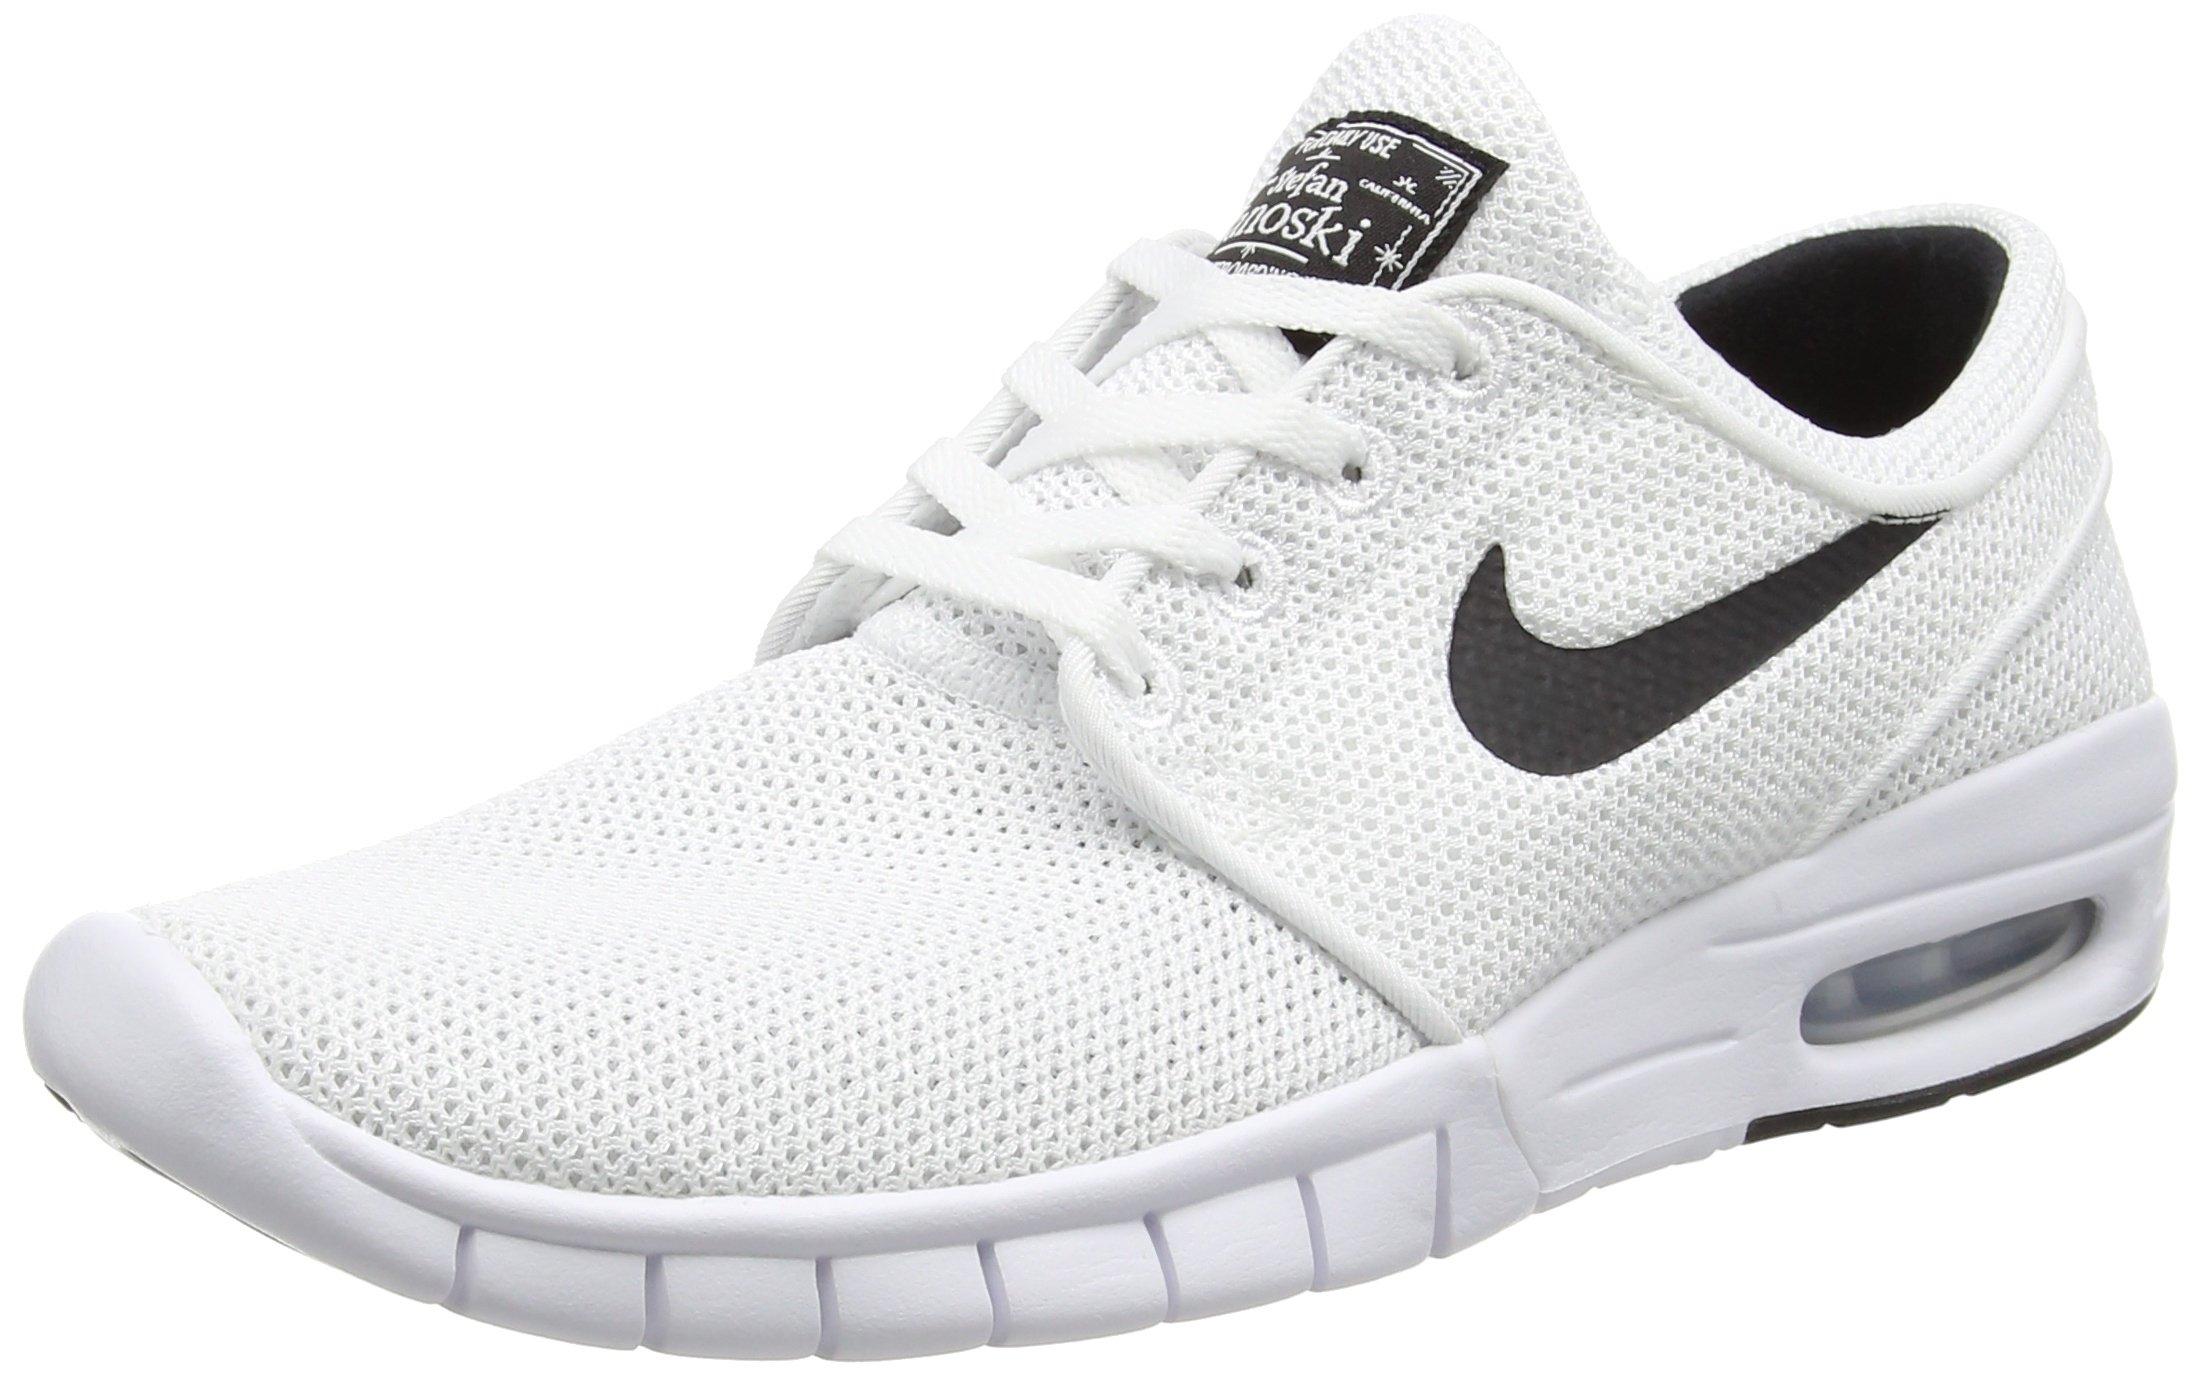 White Janoskis Nike Stefan Janoski Max Prm Kuning Sb Mens Shoes